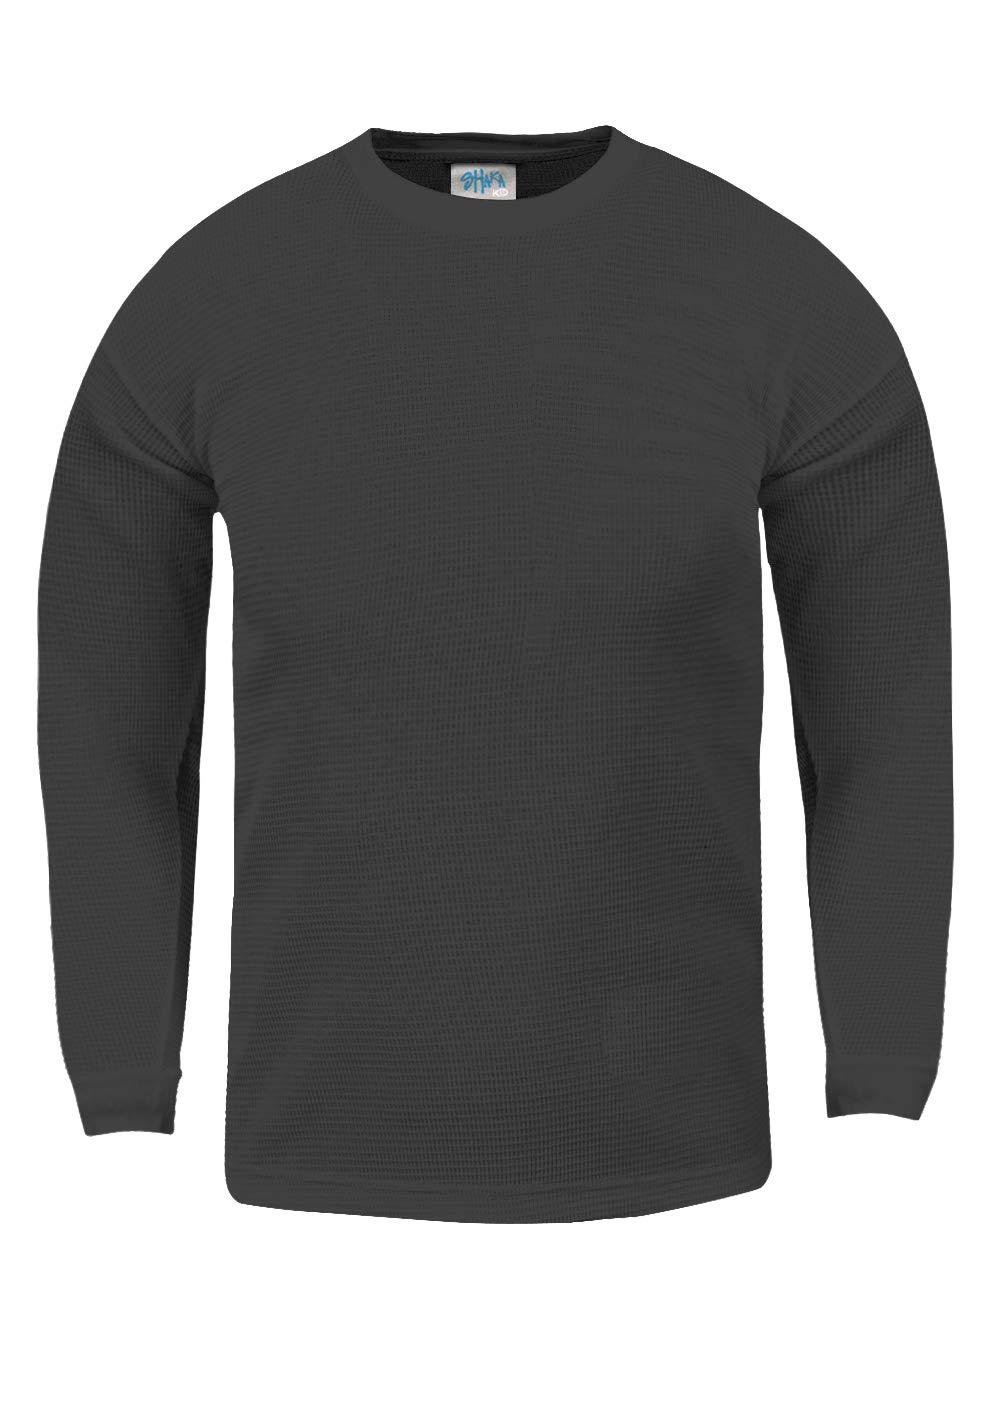 Shaka Wear KTC21_XL Thermal Long Sleeve Crewneck Waffle Shirt C.Grey XL by Shaka Wear